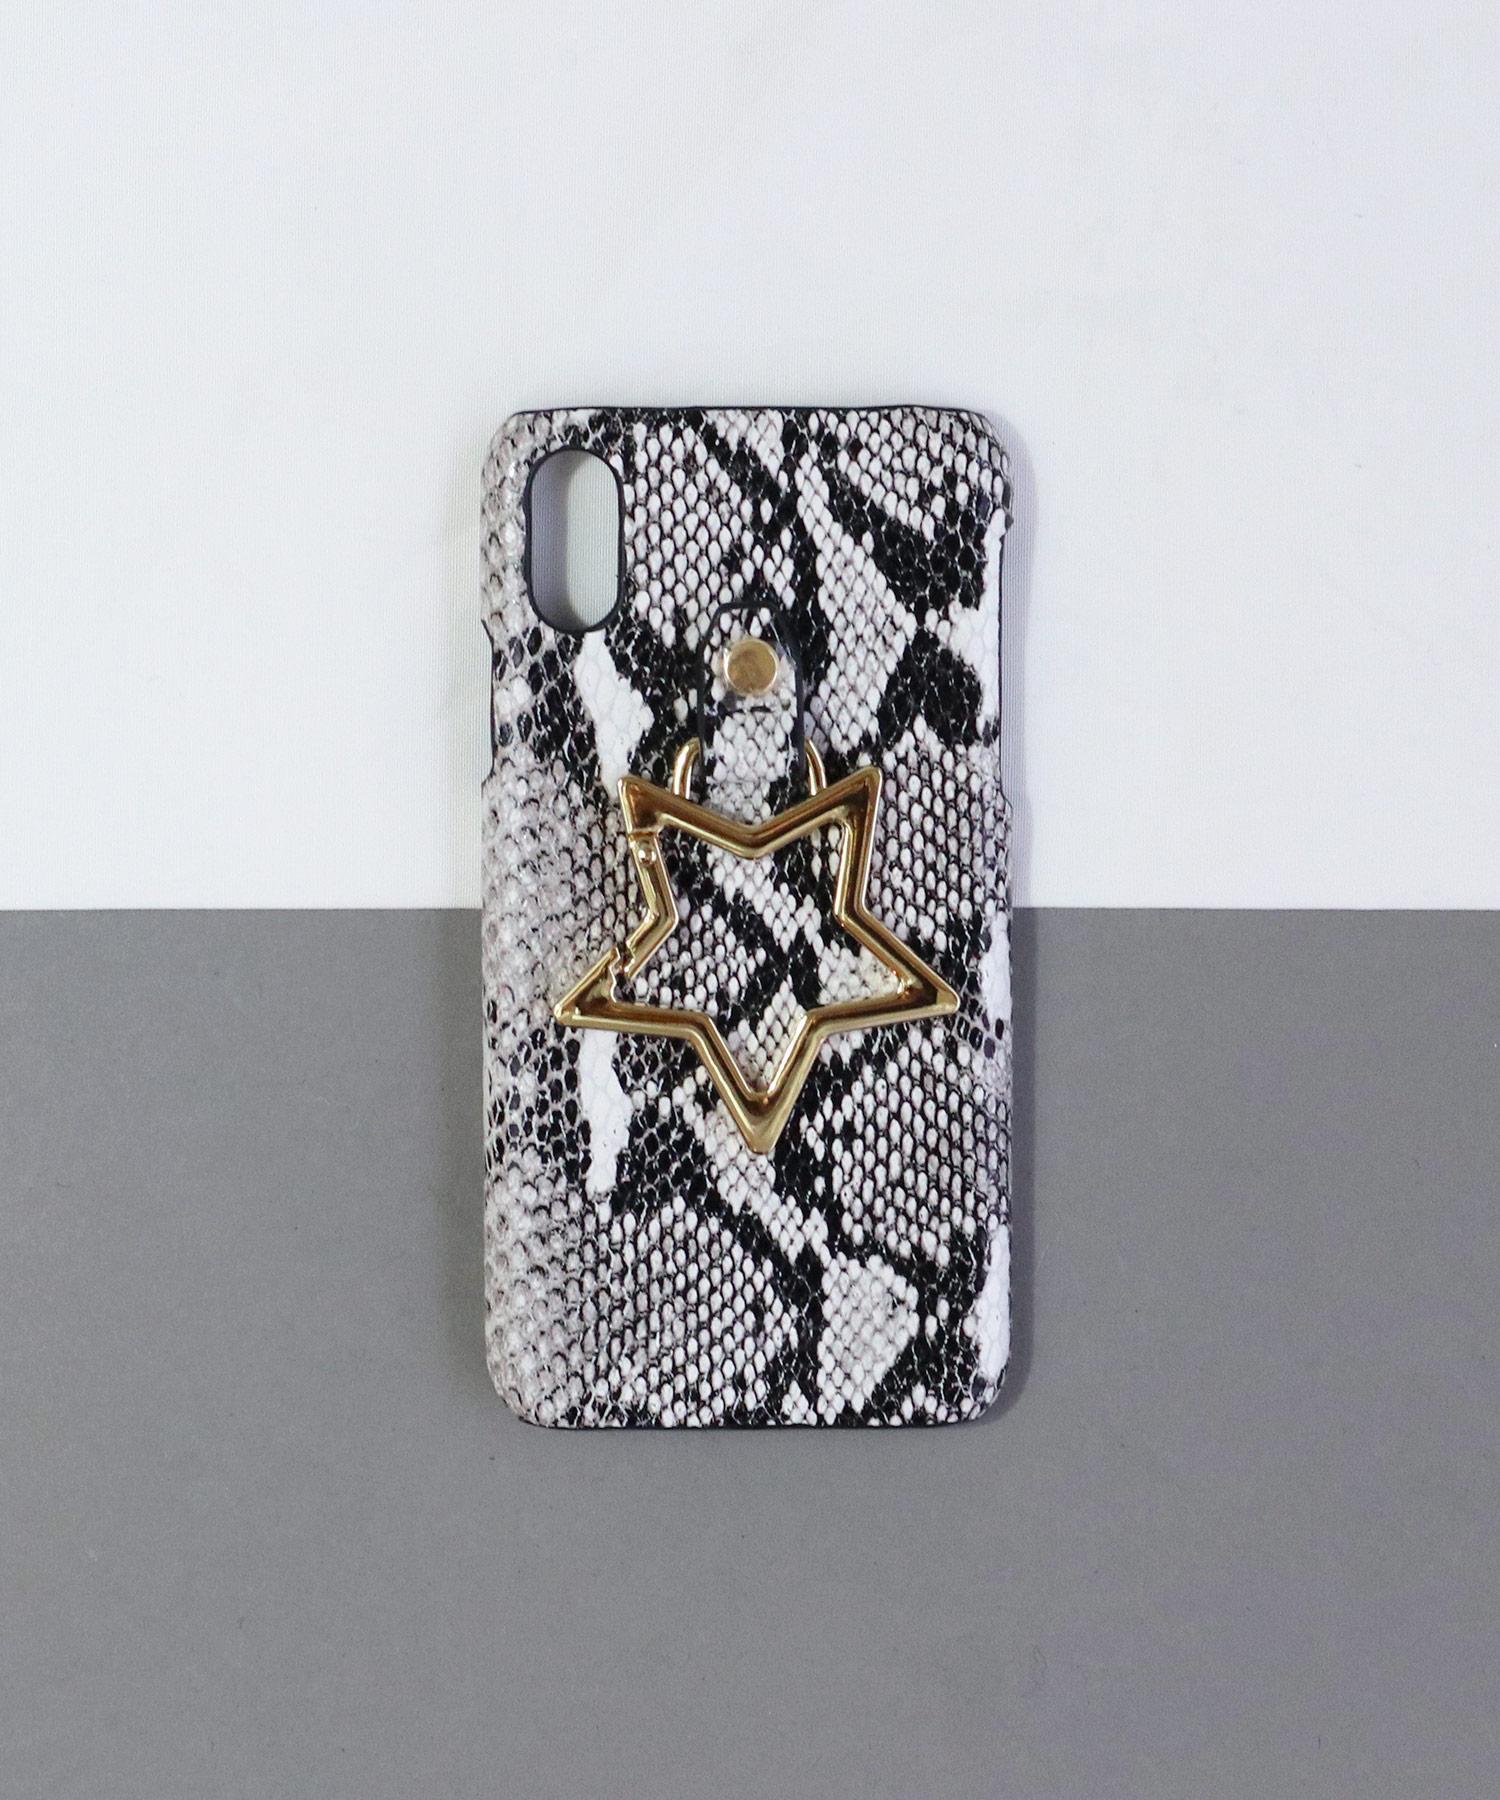 【 Hashibami / ハシバミ 】 # iPhone X/XS スマホ・携帯カバー リング付きケース